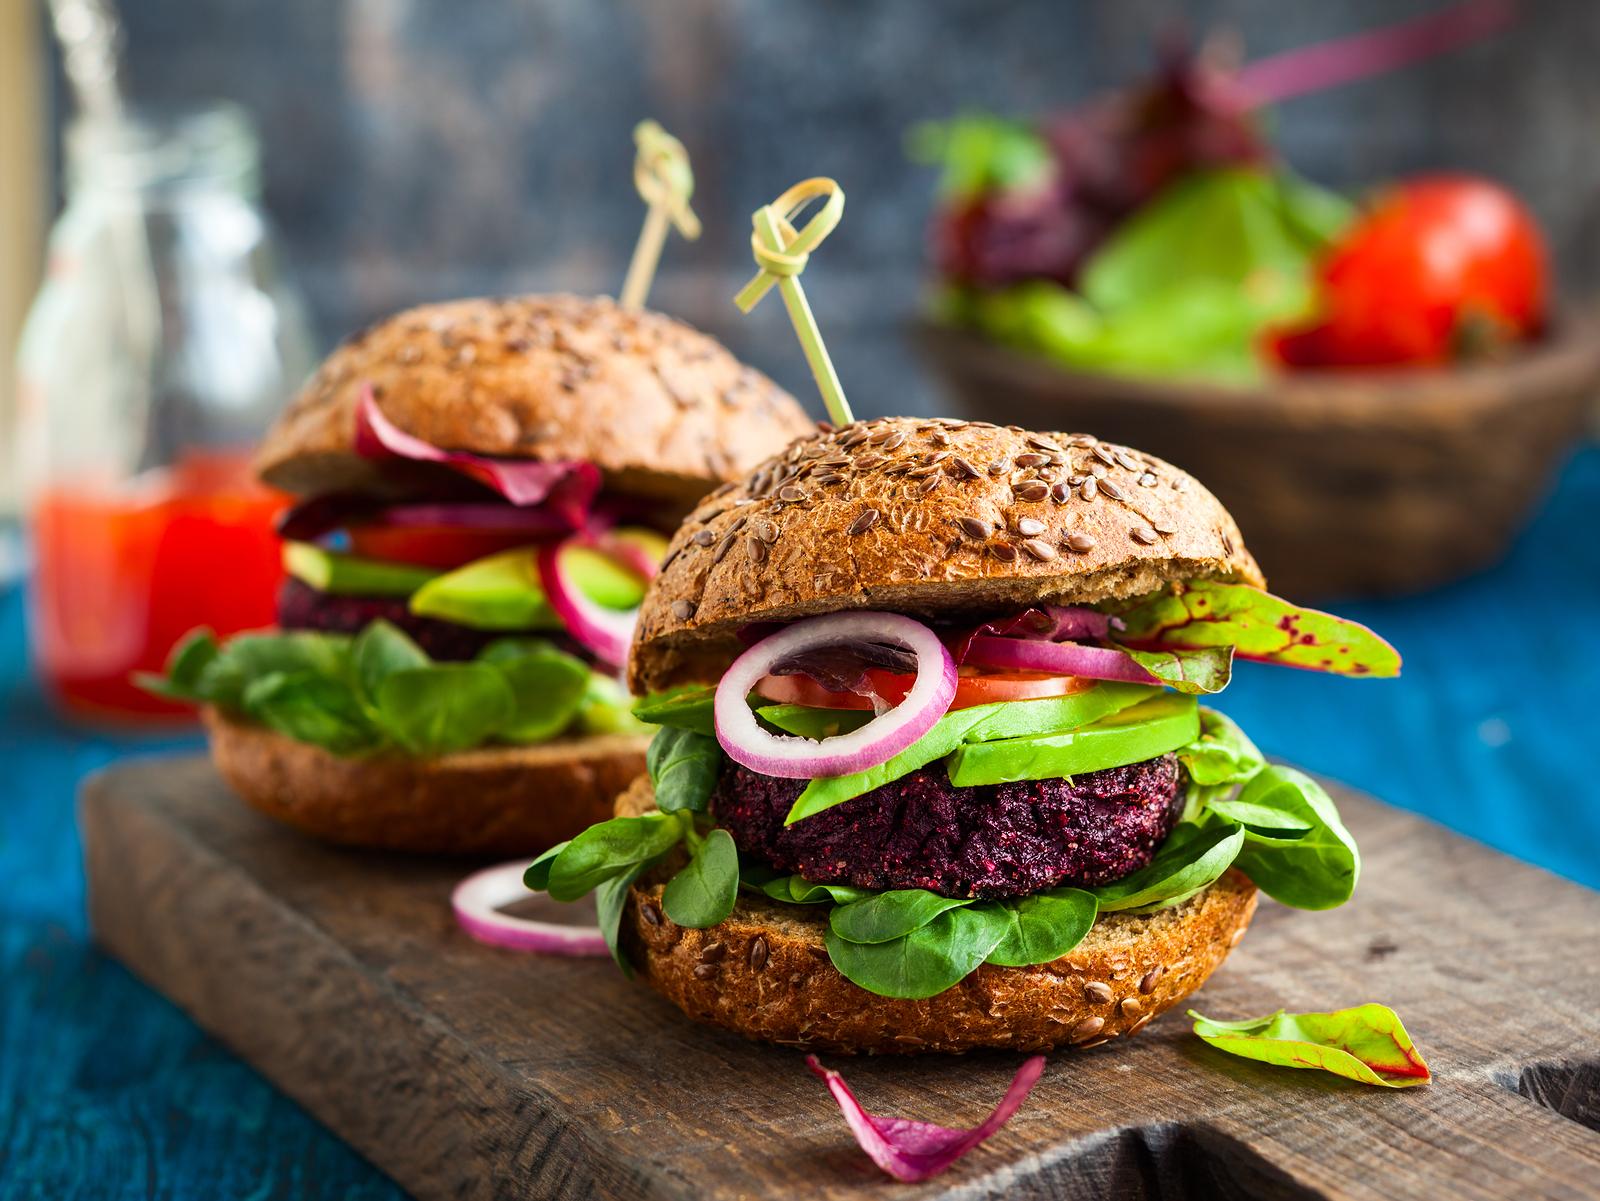 bigstock-Veggie-beet-and-quinoa-burger--87357806.jpg